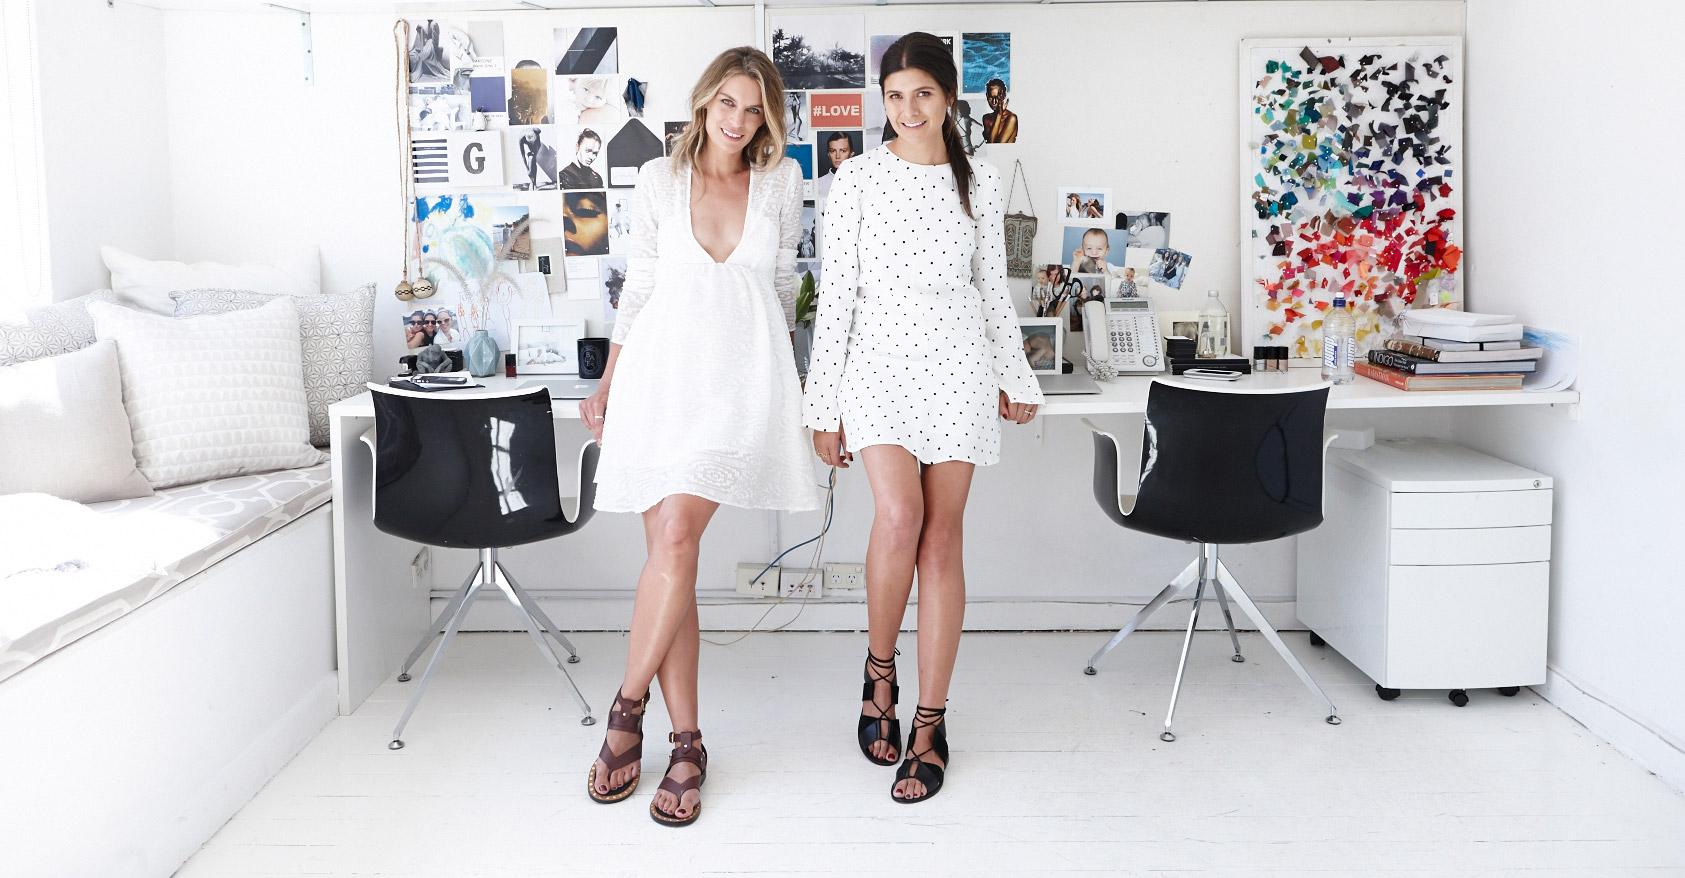 At My Desk: Becky Cooper & Bridget Yorston